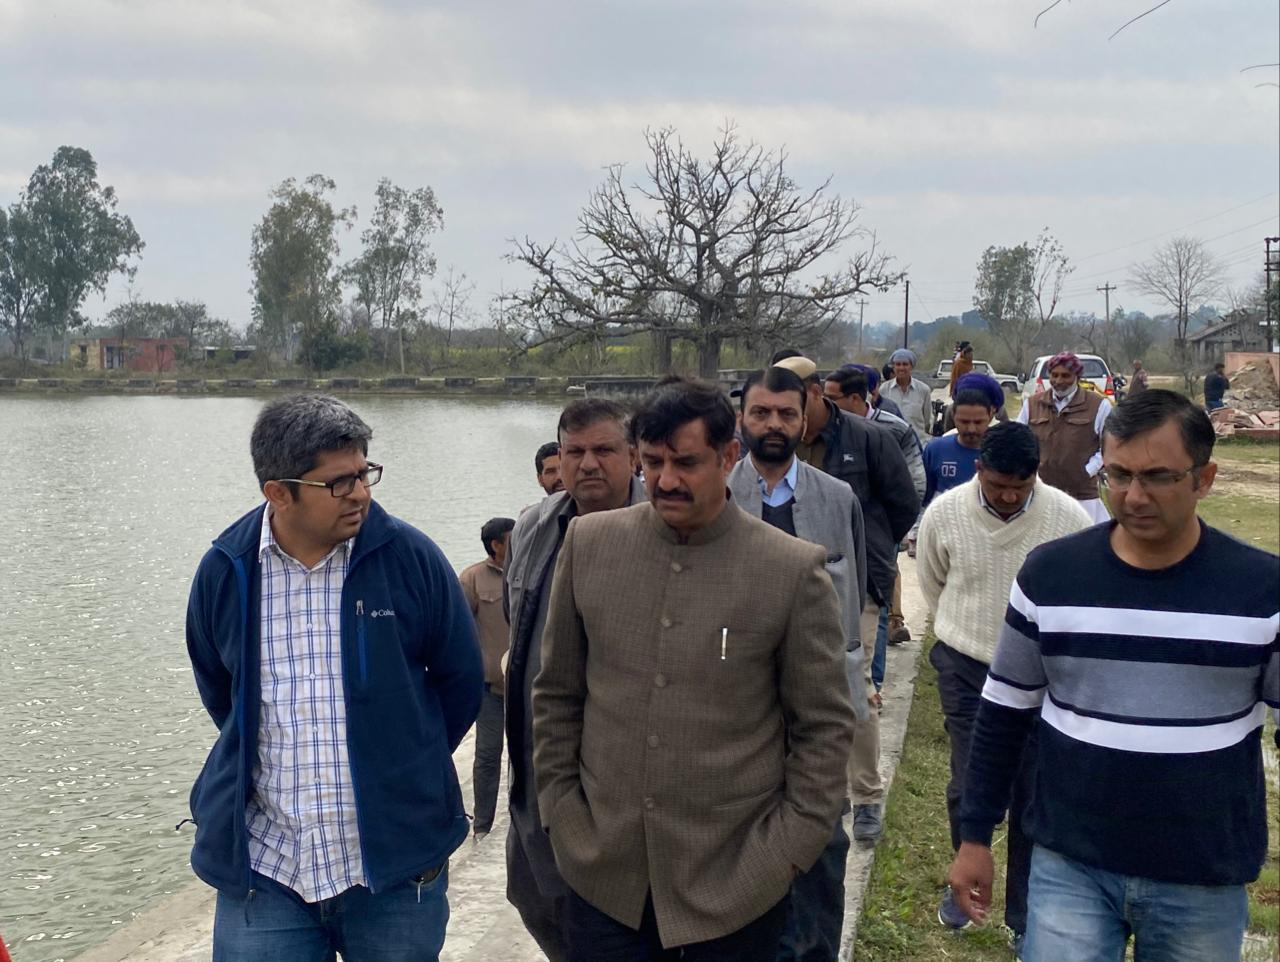 पूबोवाल के तालाब के सौन्दर्यीकरण को लेकर प्रो राम कुमार ने अधिकारियों संग किया निरीक्षण